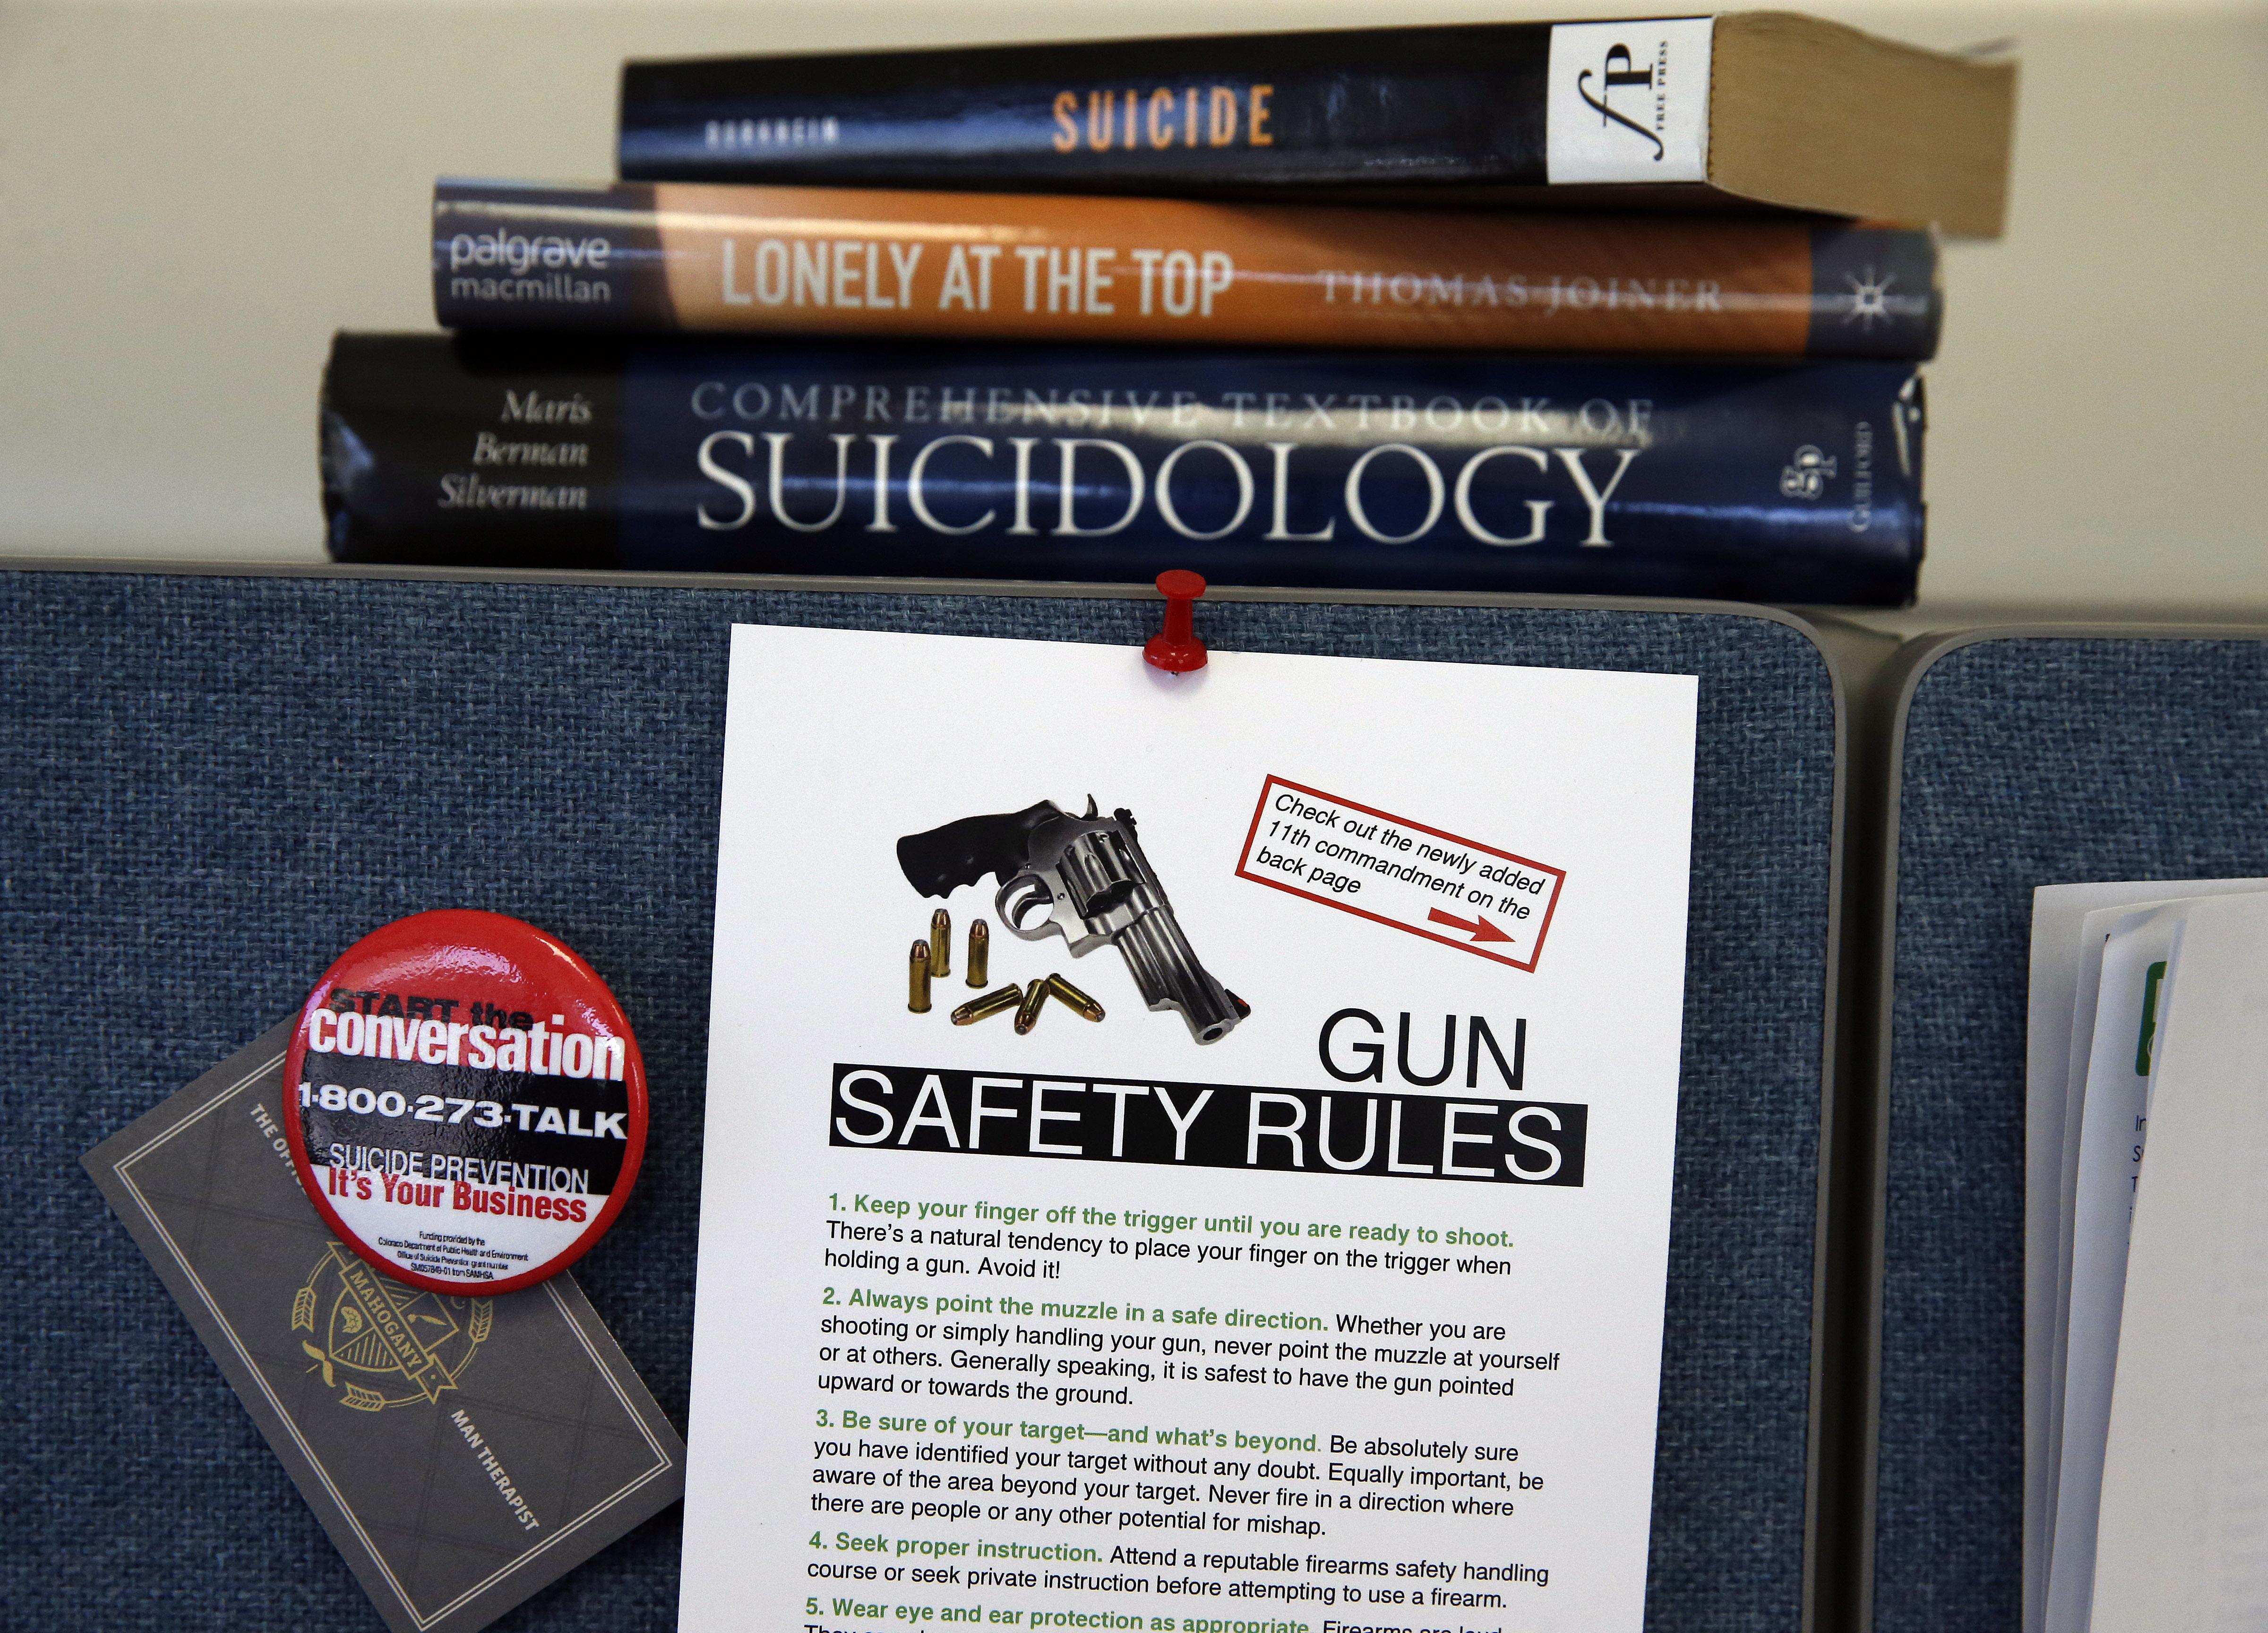 Photo: Colorado Suicide Prevention Office Gun Safety